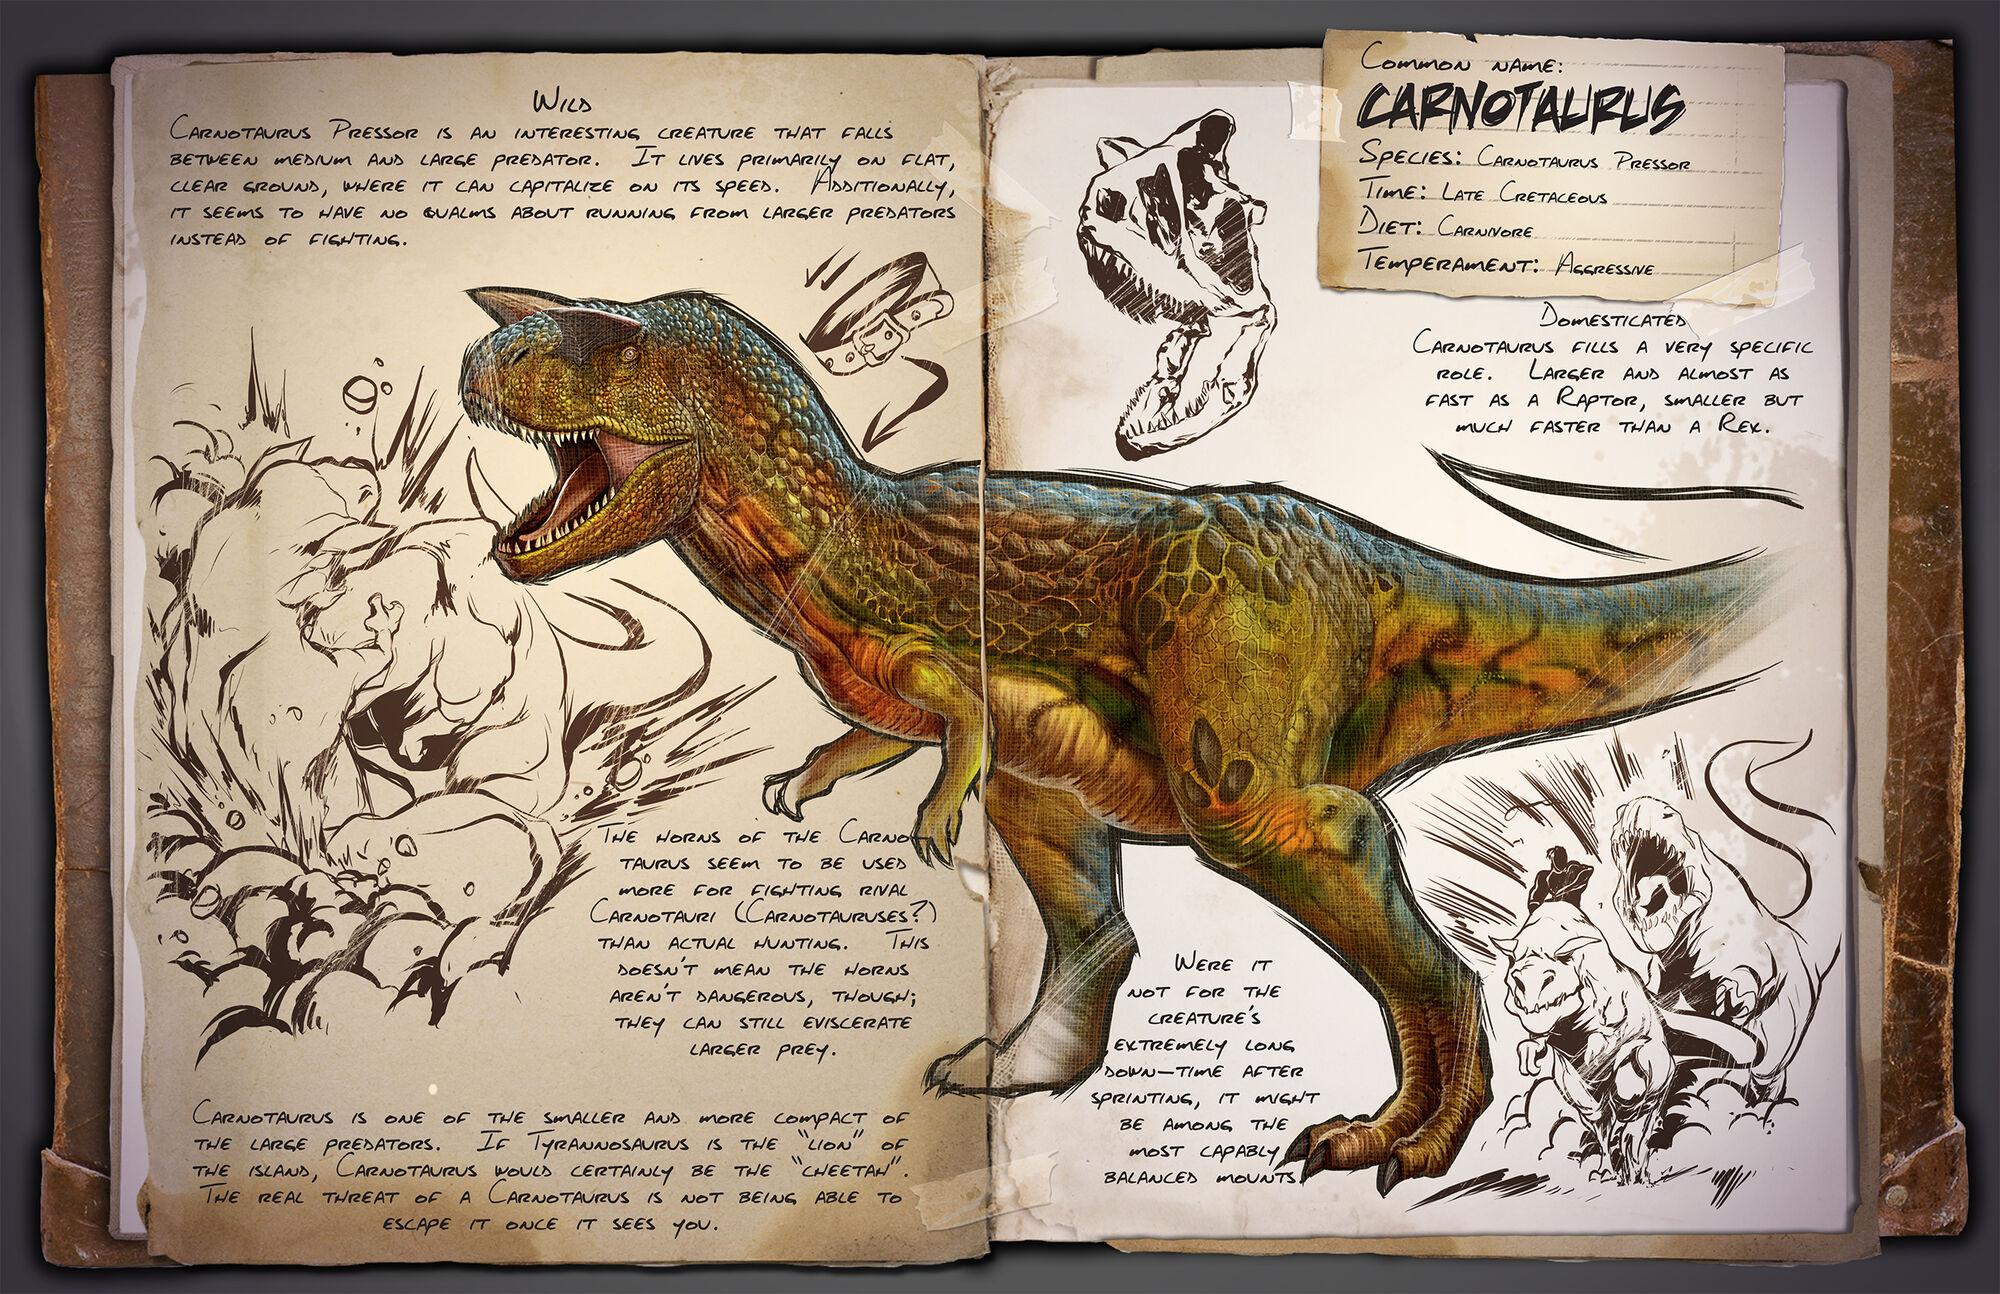 22d95b0f35 Carnotaurus | ARK: Survival Evolved Wiki | FANDOM powered by Wikia